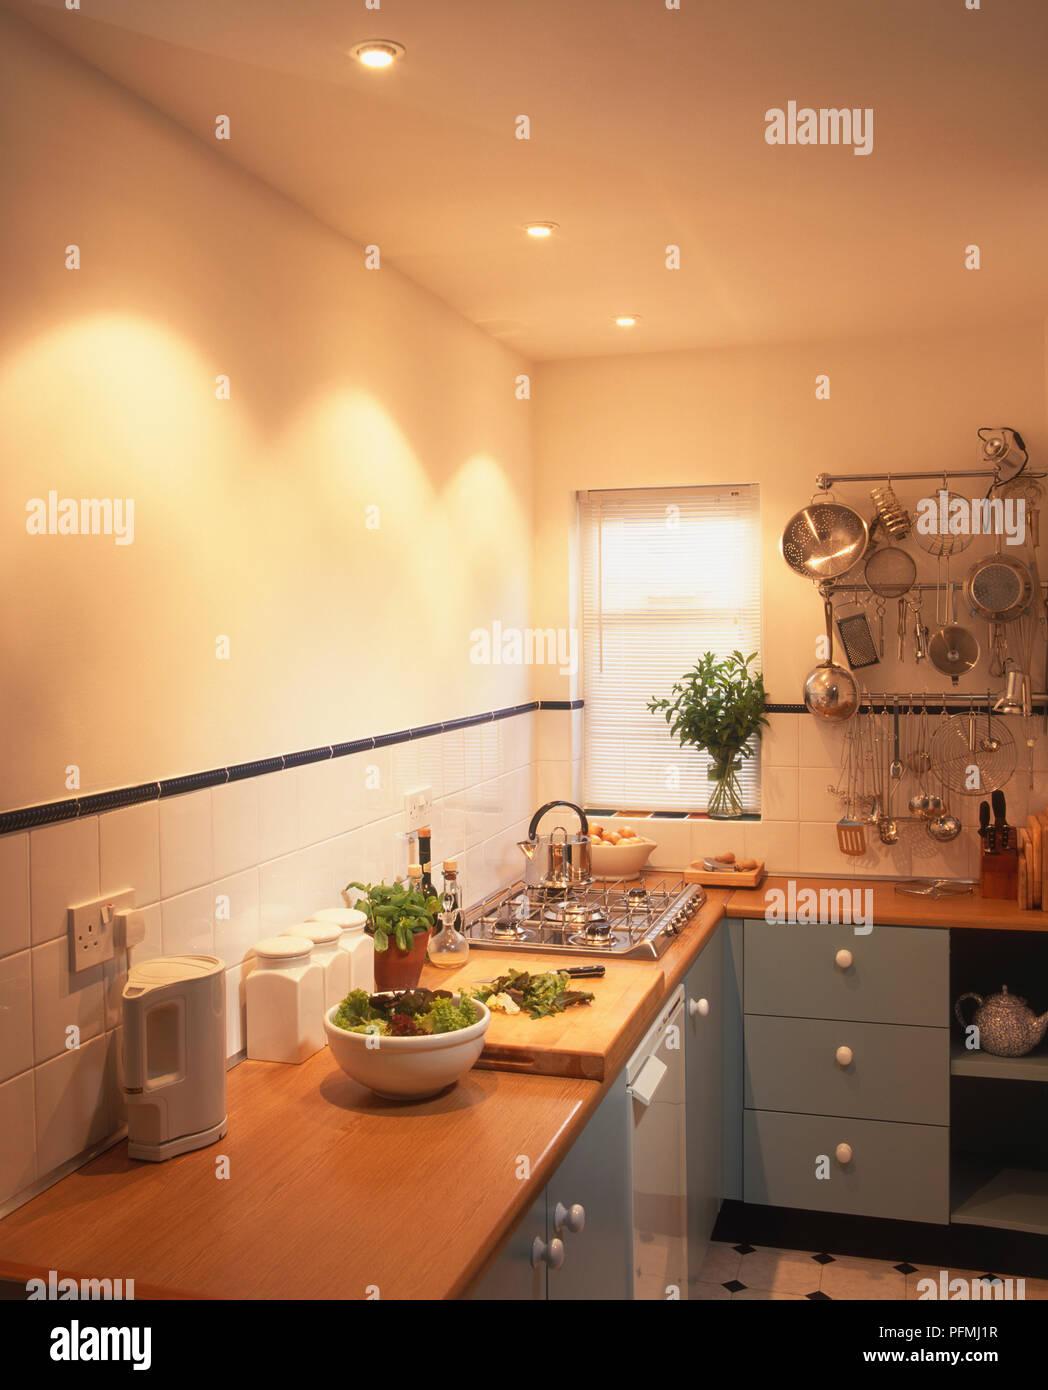 Ceiling Downlights Over Kitchen Worktop Stock Photo Alamy